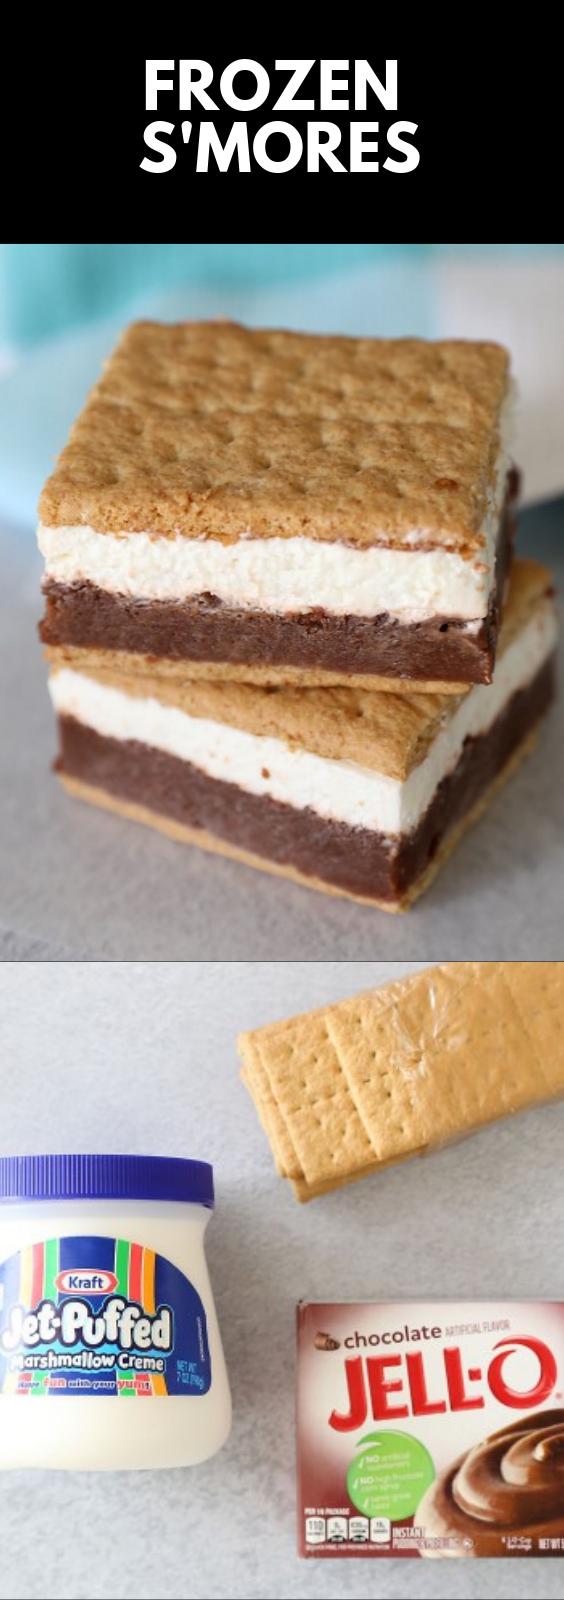 S'mores Dessert Recipes Frozen S'mores Dessert RecipesFrozen S'mores Dessert Recipes